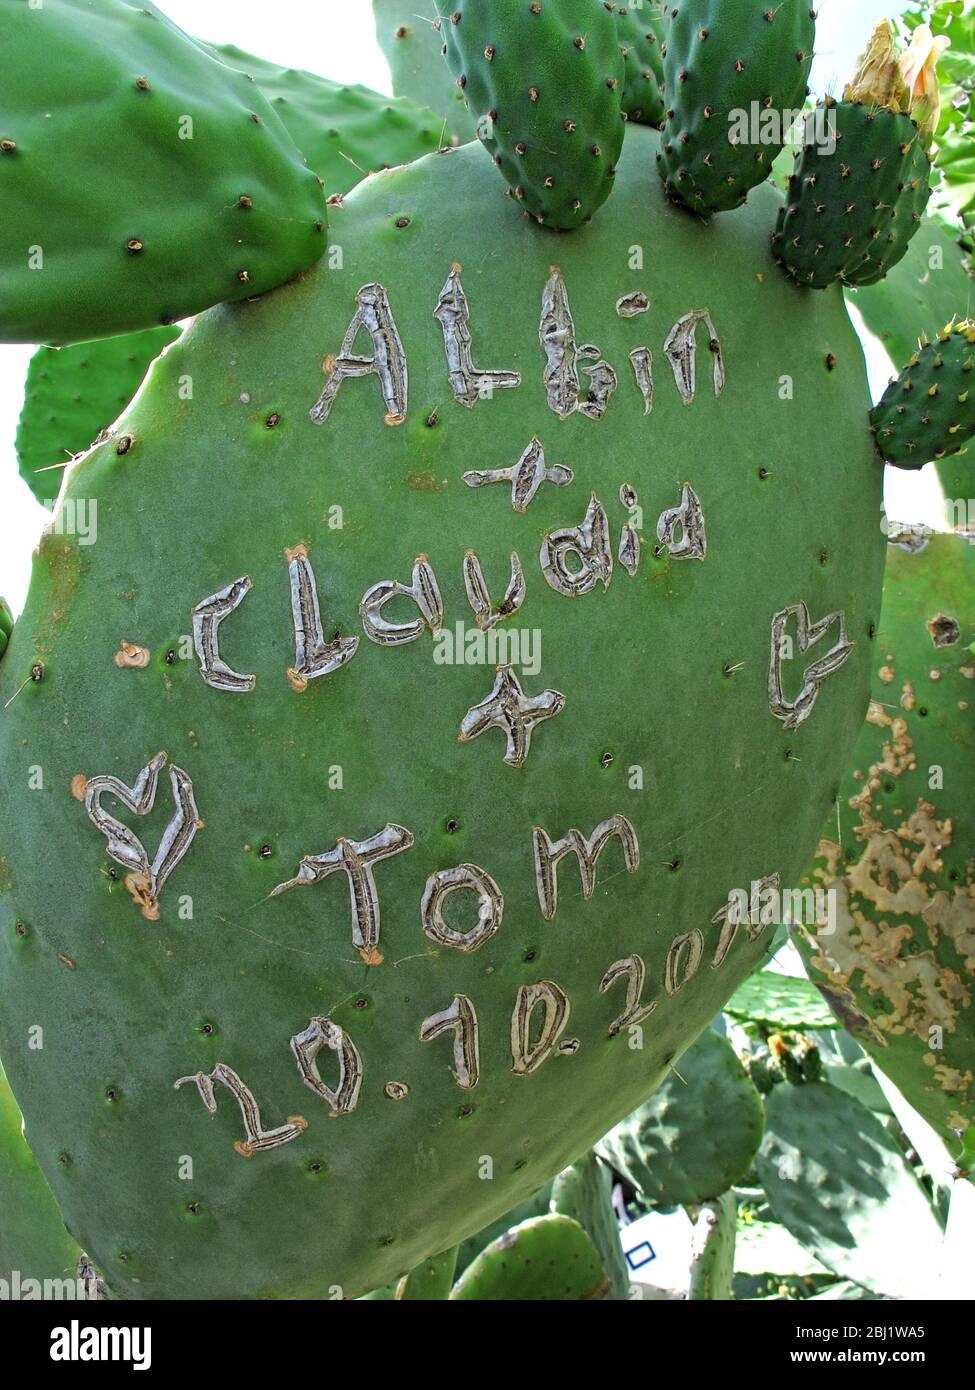 Gotonysmith,Hotpixuk,@Hotpixuk,Spain,Loz,2k11,on cactus,Espana